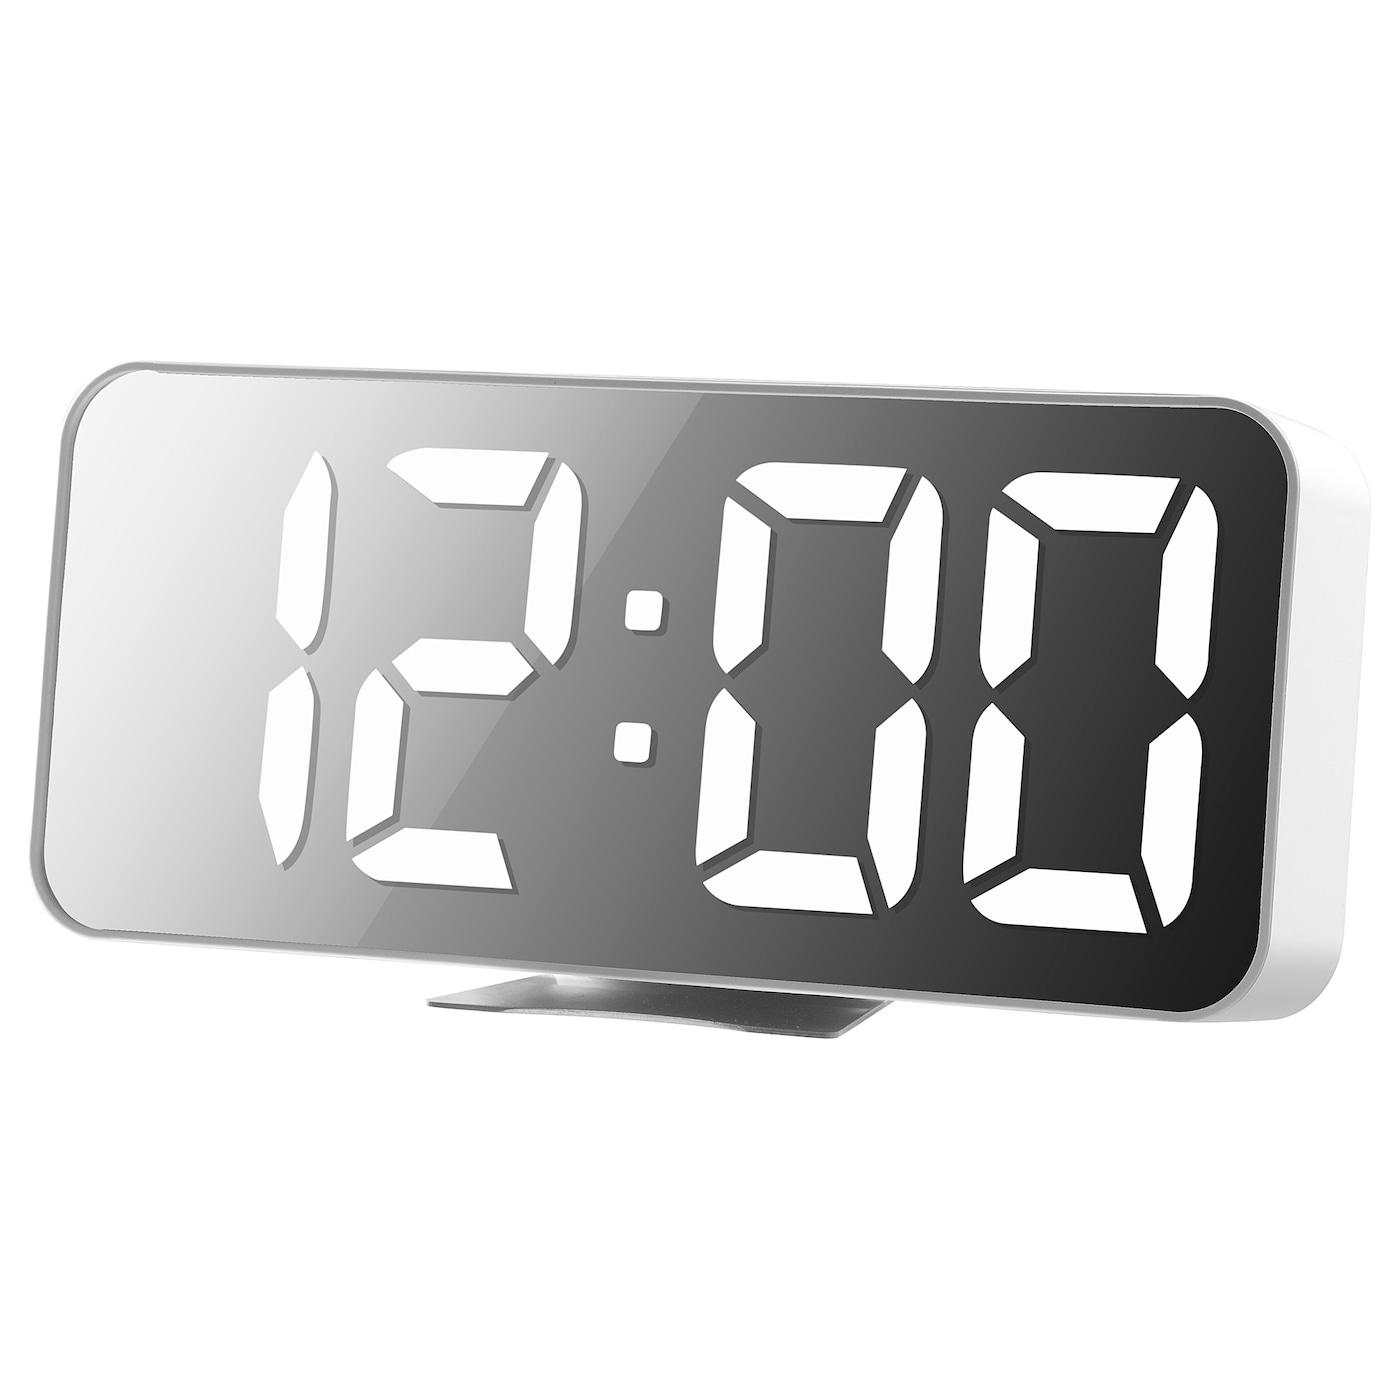 NOLLNING ノールニング 時計/温度計/アラーム